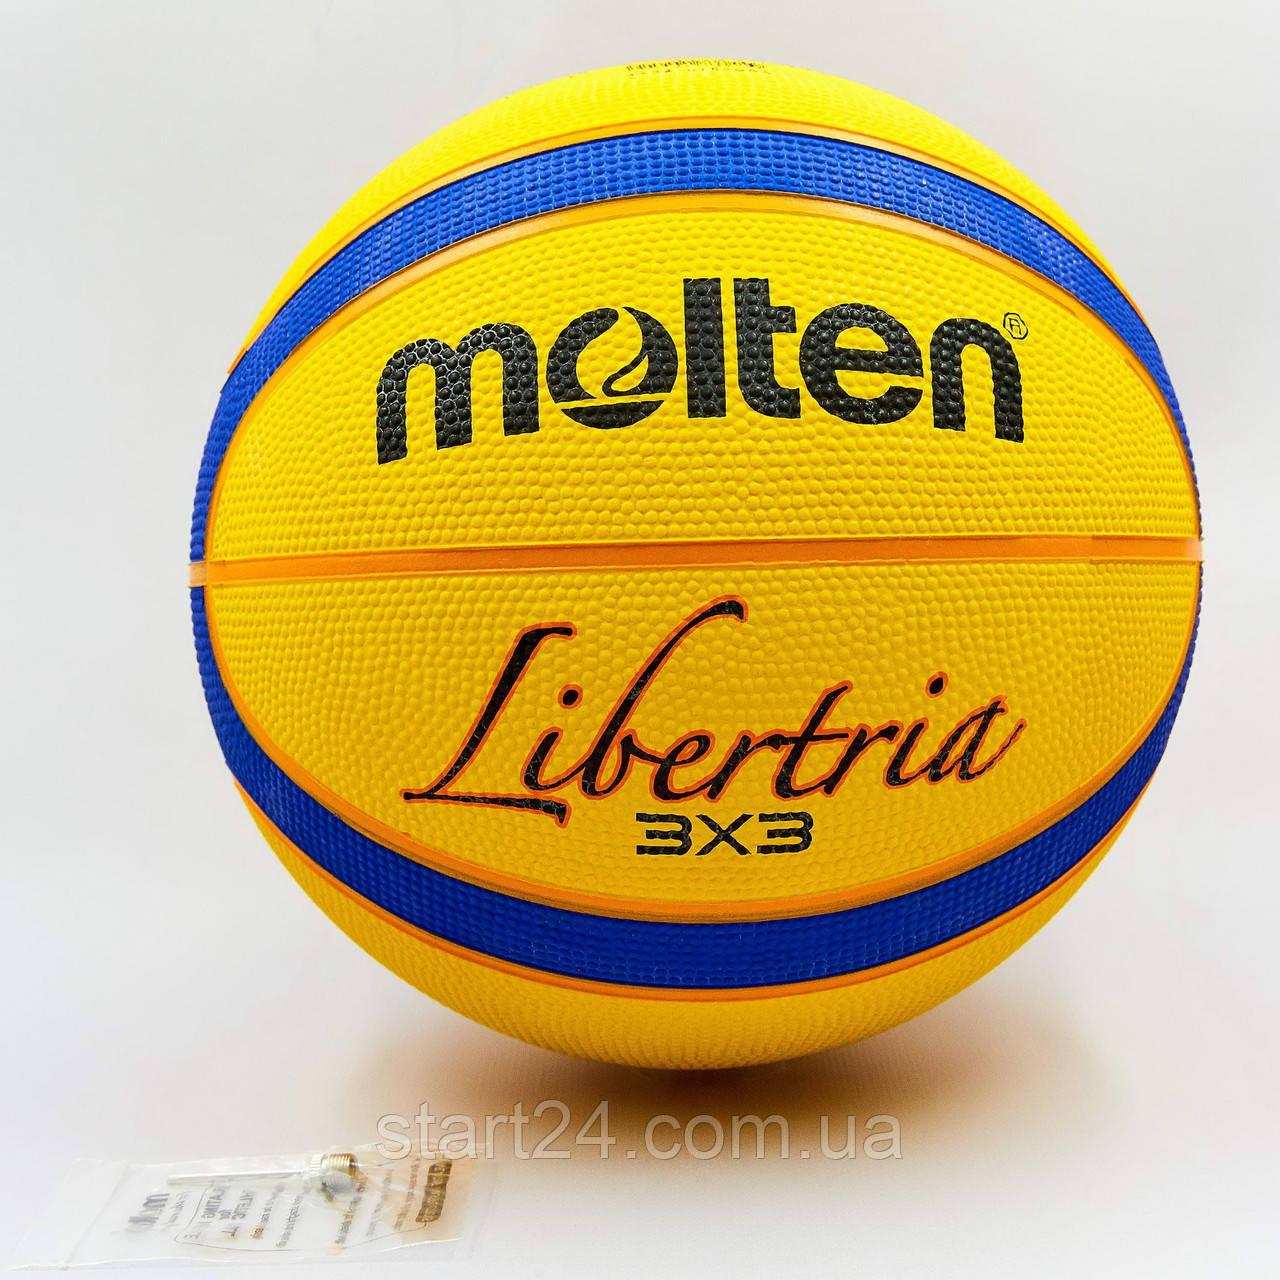 Мяч баскетбольный резиновый №7 MOLTEN B33T2000  3X3 (резина, бутил, желтый-синий)